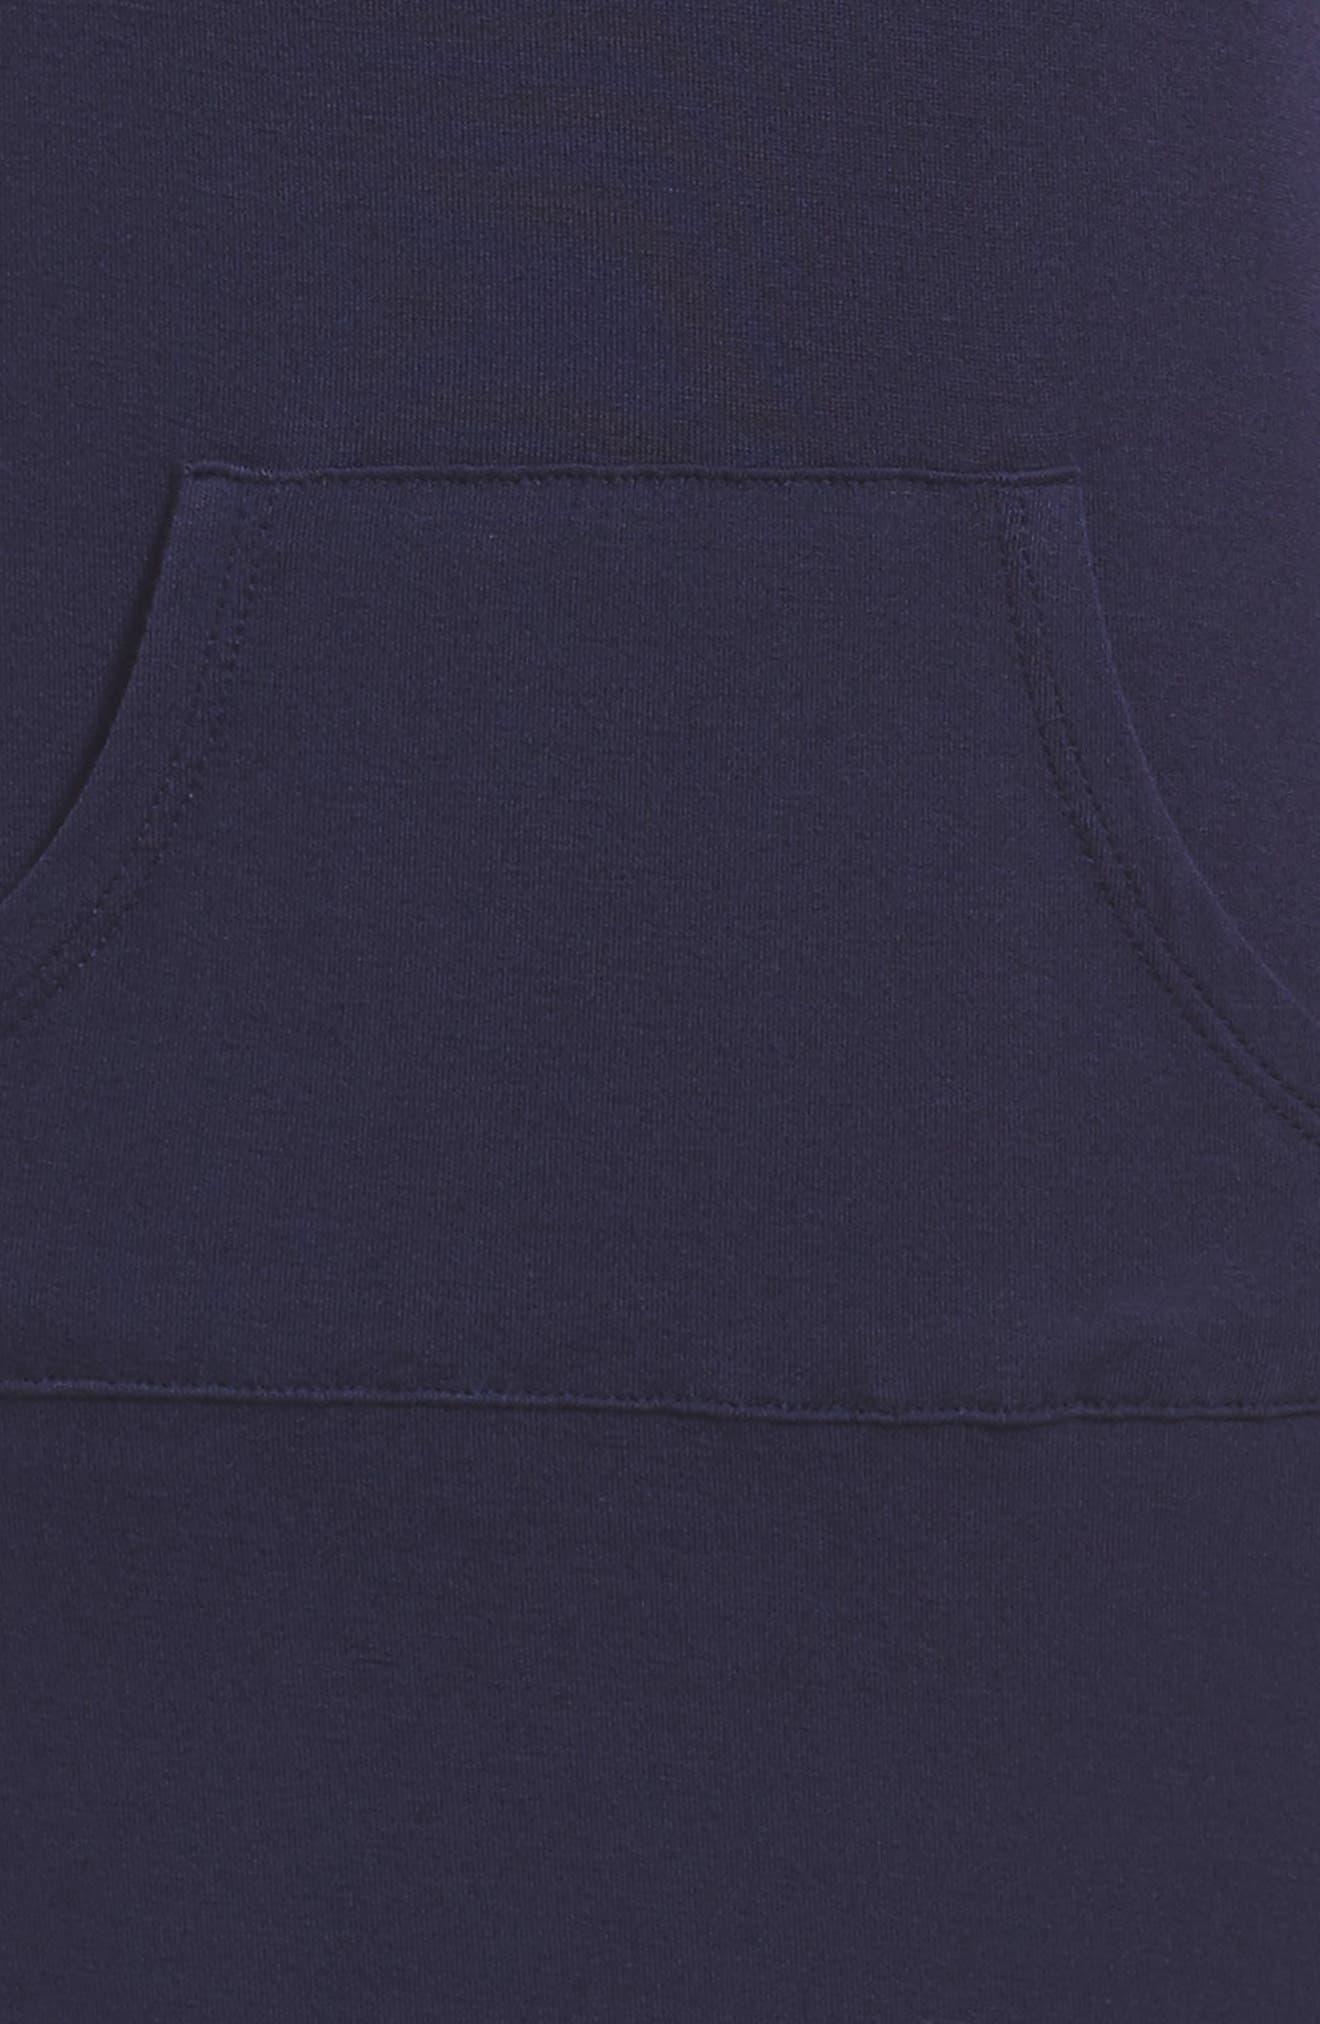 Knit Hoodie Dress,                             Alternate thumbnail 3, color,                             Eclipse